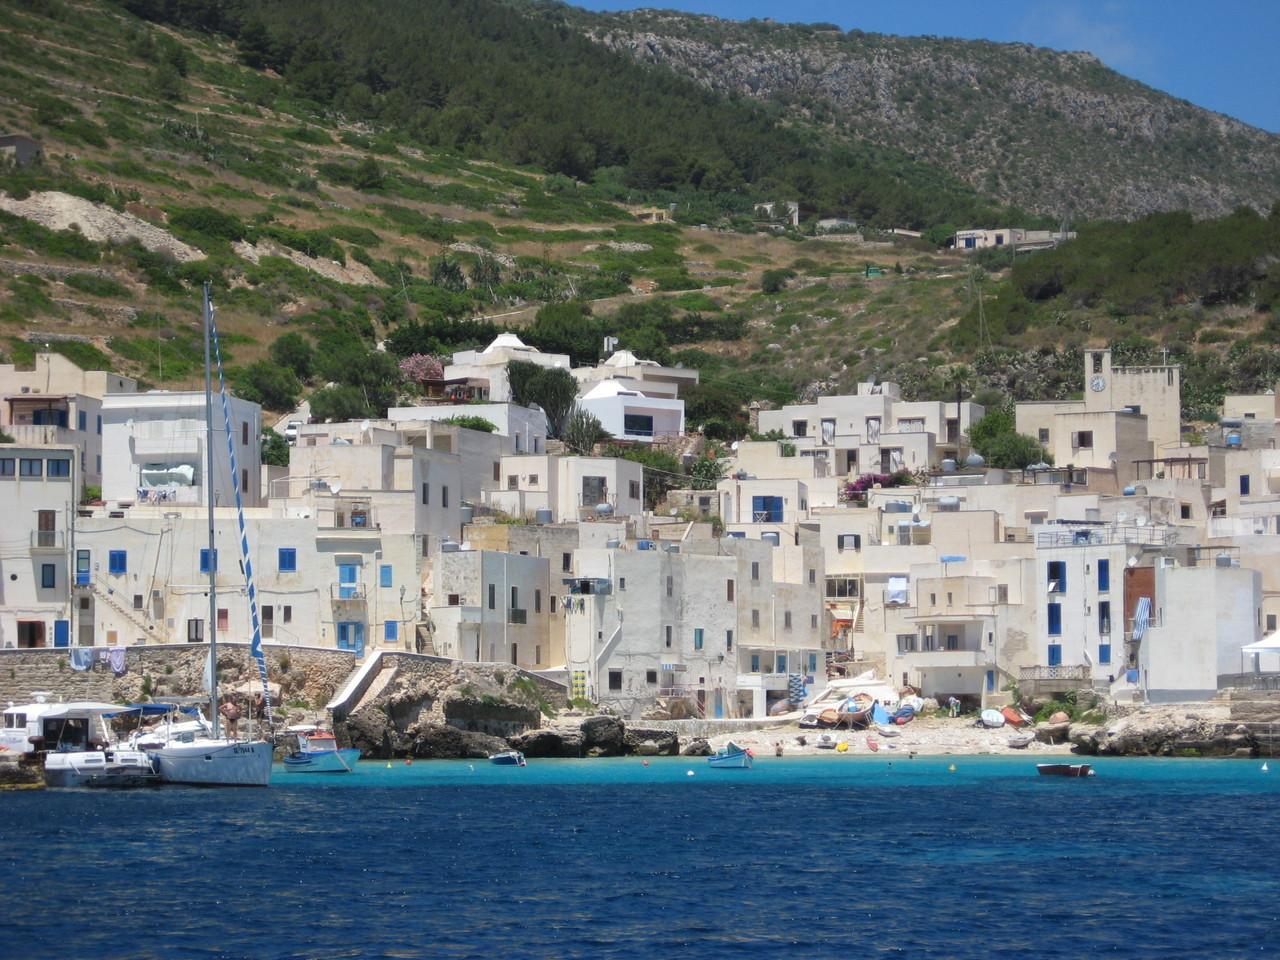 Sicilia - Isole Egadi - Marettimo